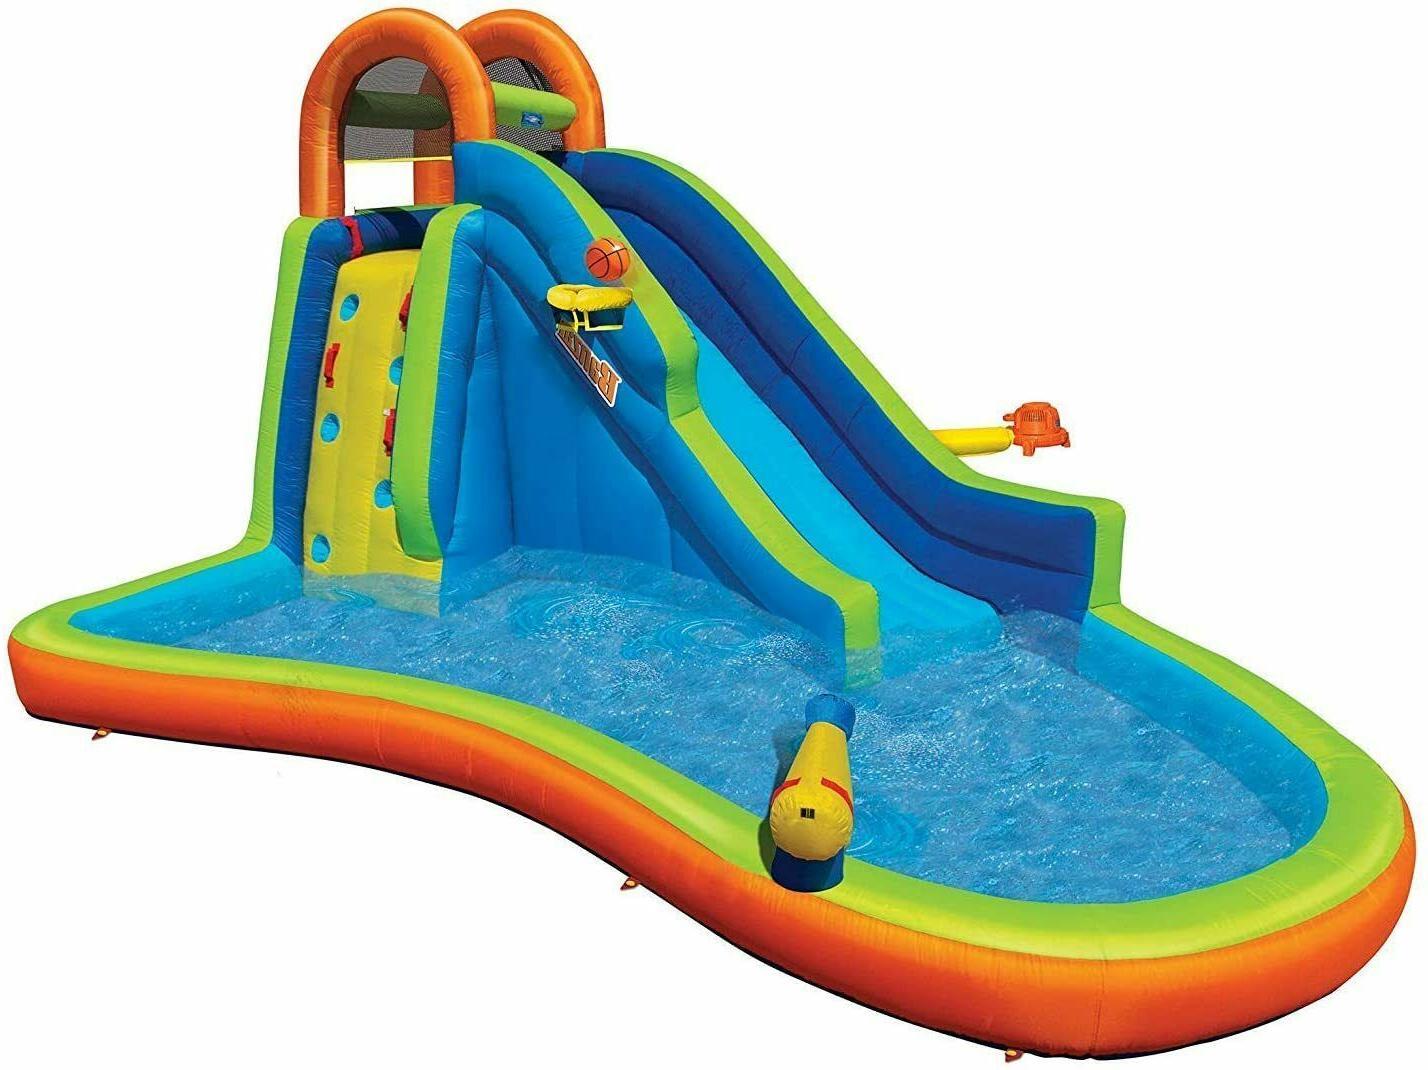 big blast water park inflatable slide sports